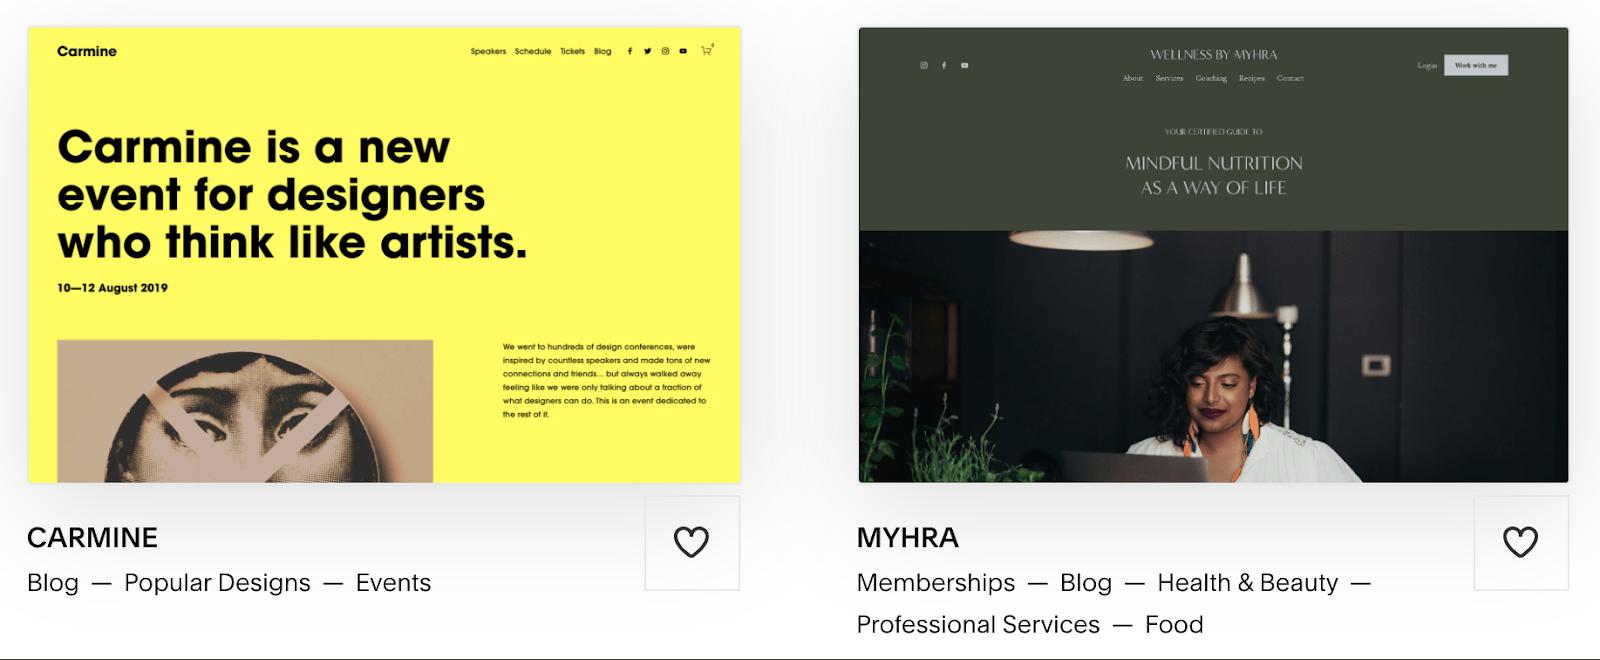 Squarespace Carmine and Myhra templates